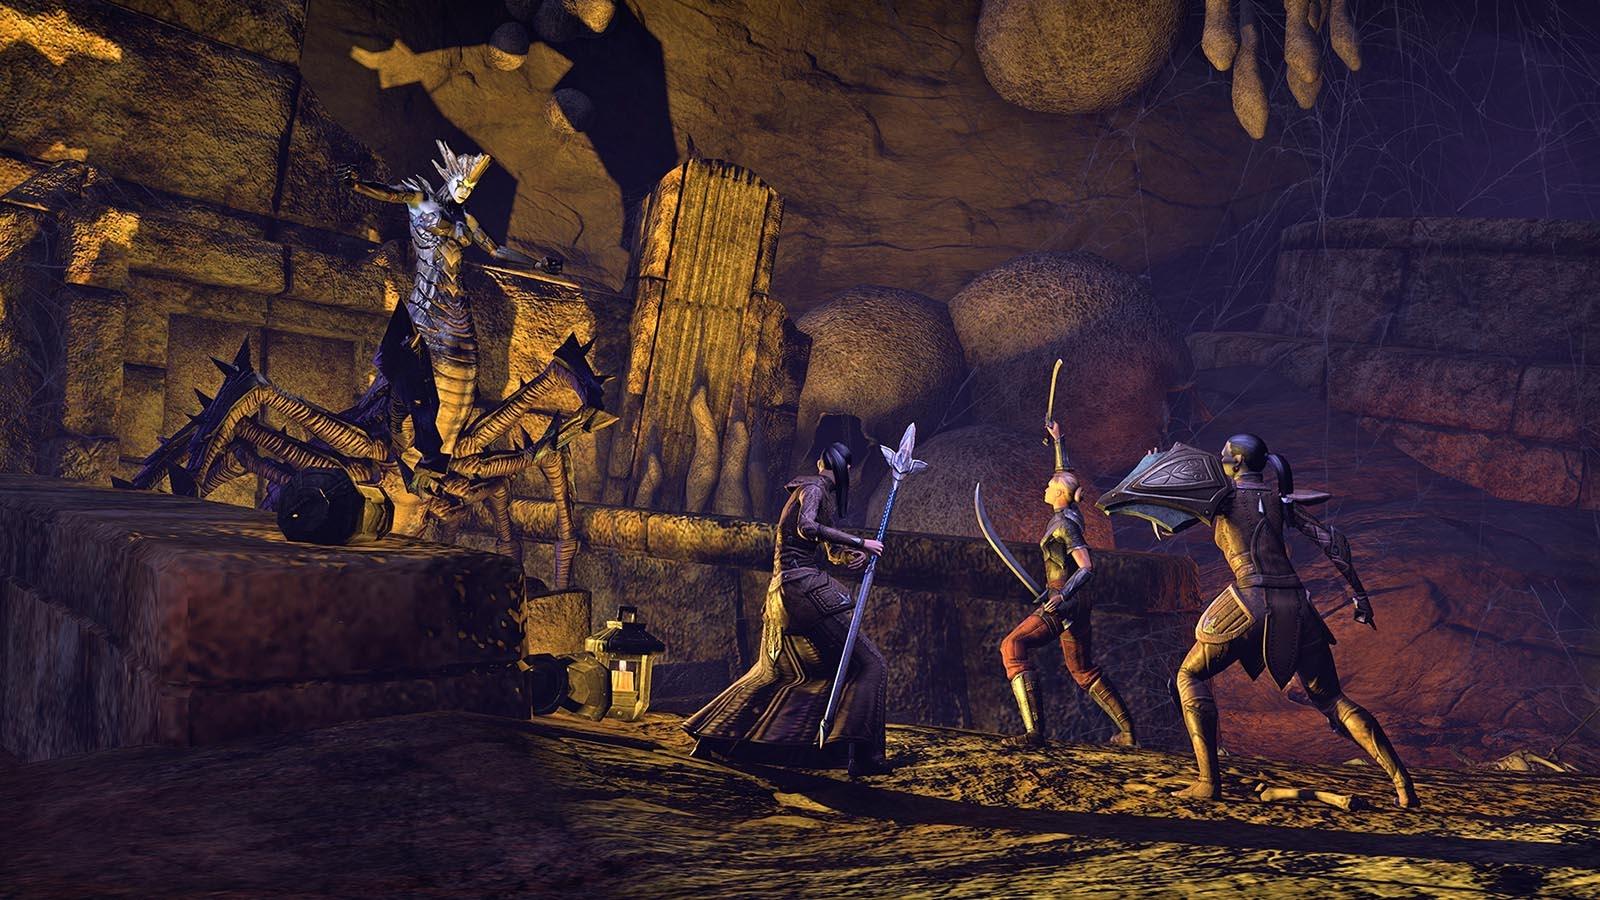 Elder Scrolls Online Screenshots Explore Ruins, Caves - CINEMABLEND